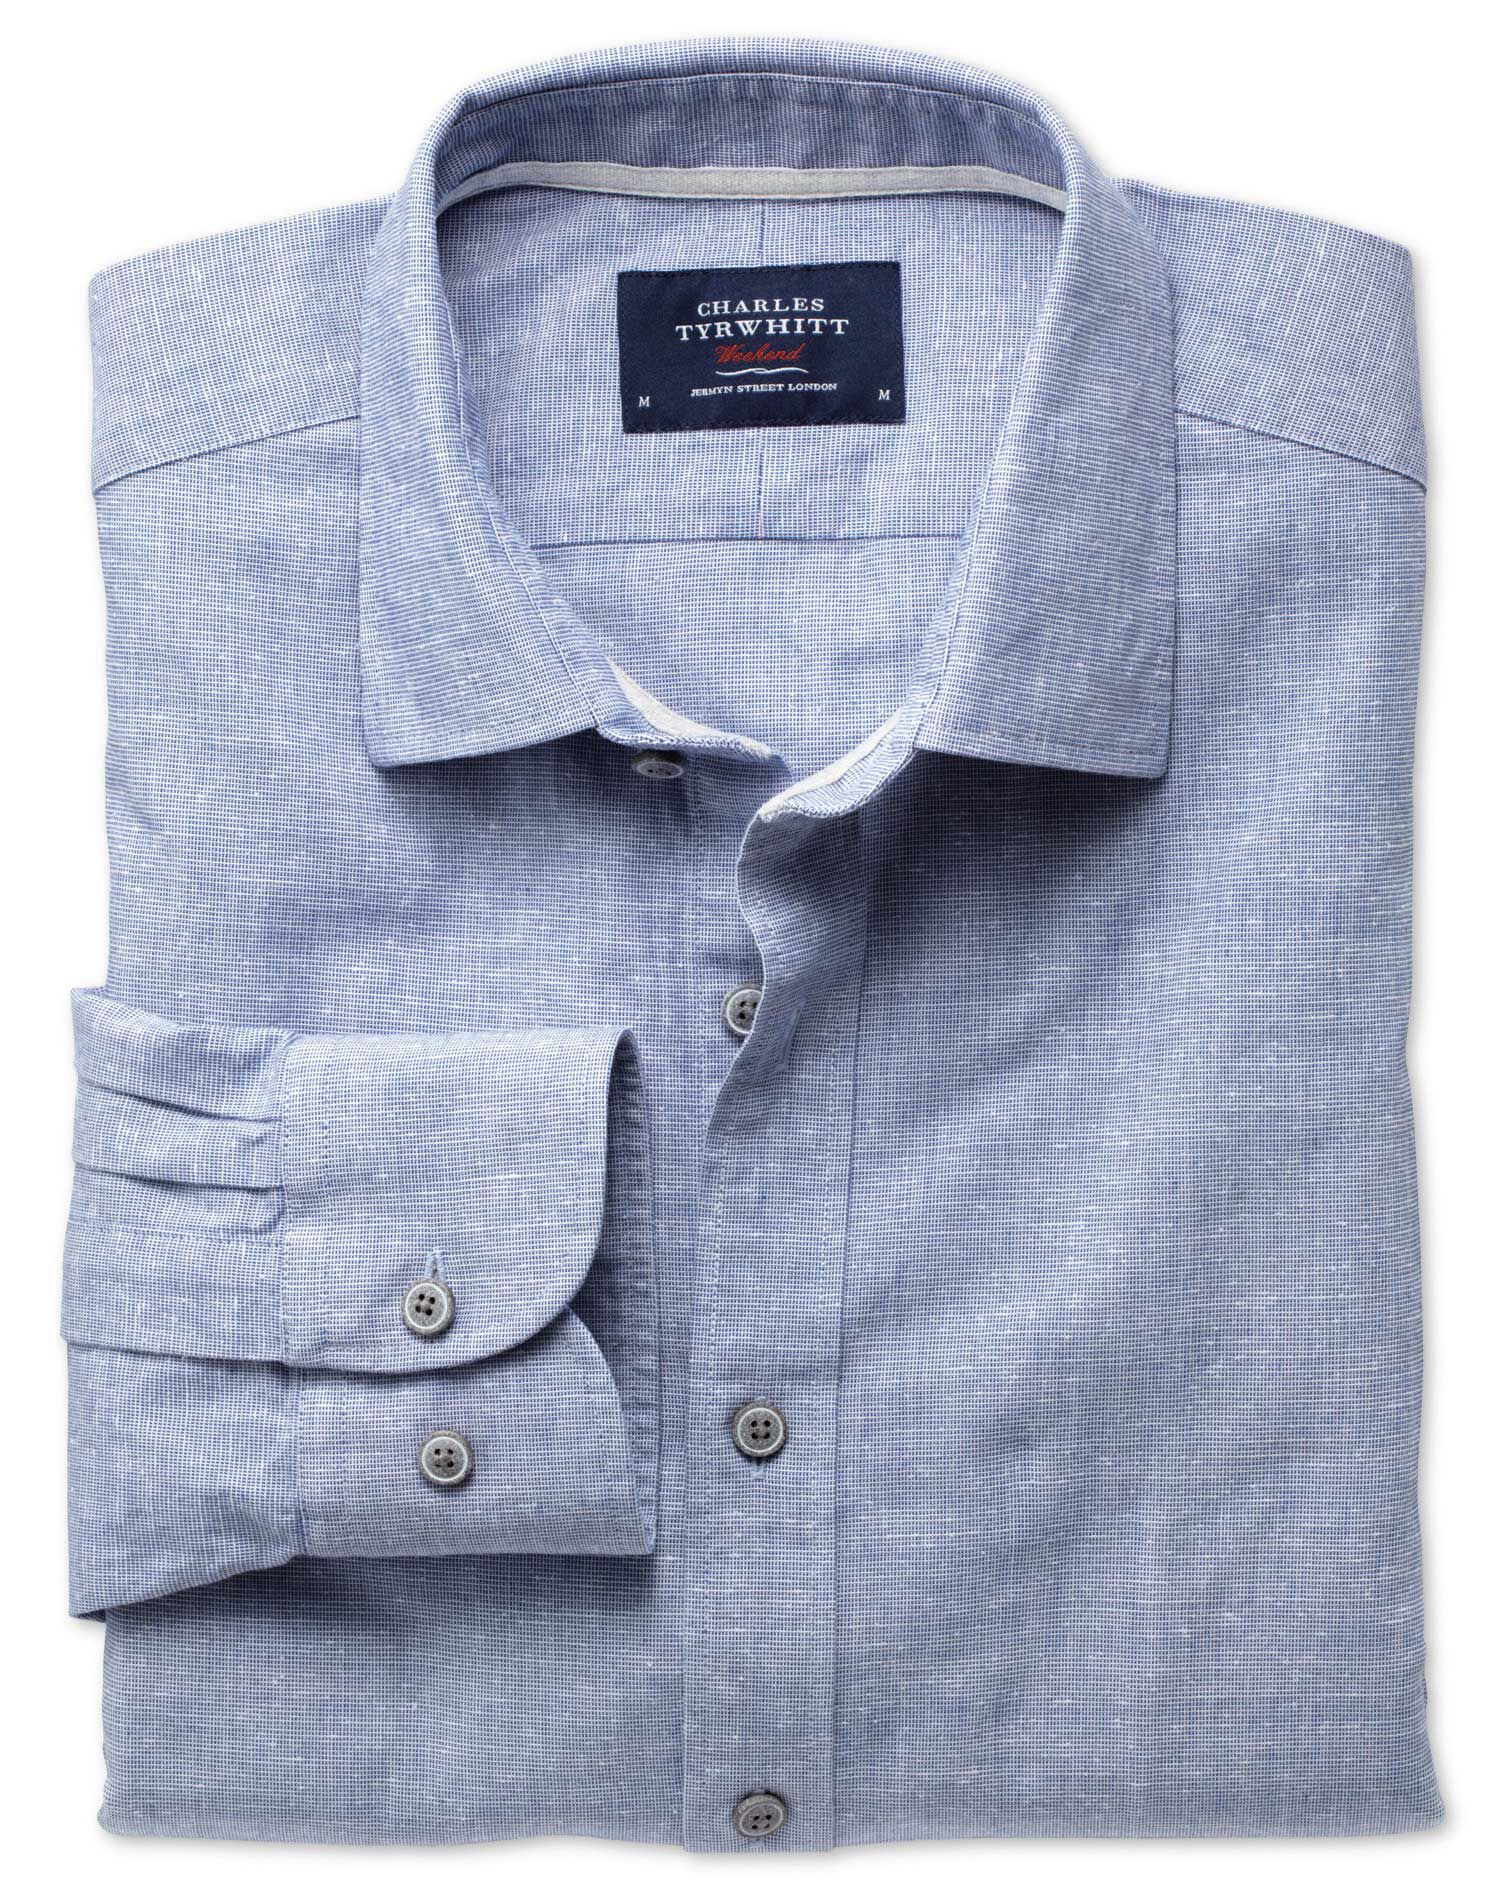 Slim Fit Slub Cotton Blue Shirt Single Cuff Size XS by Charles Tyrwhitt